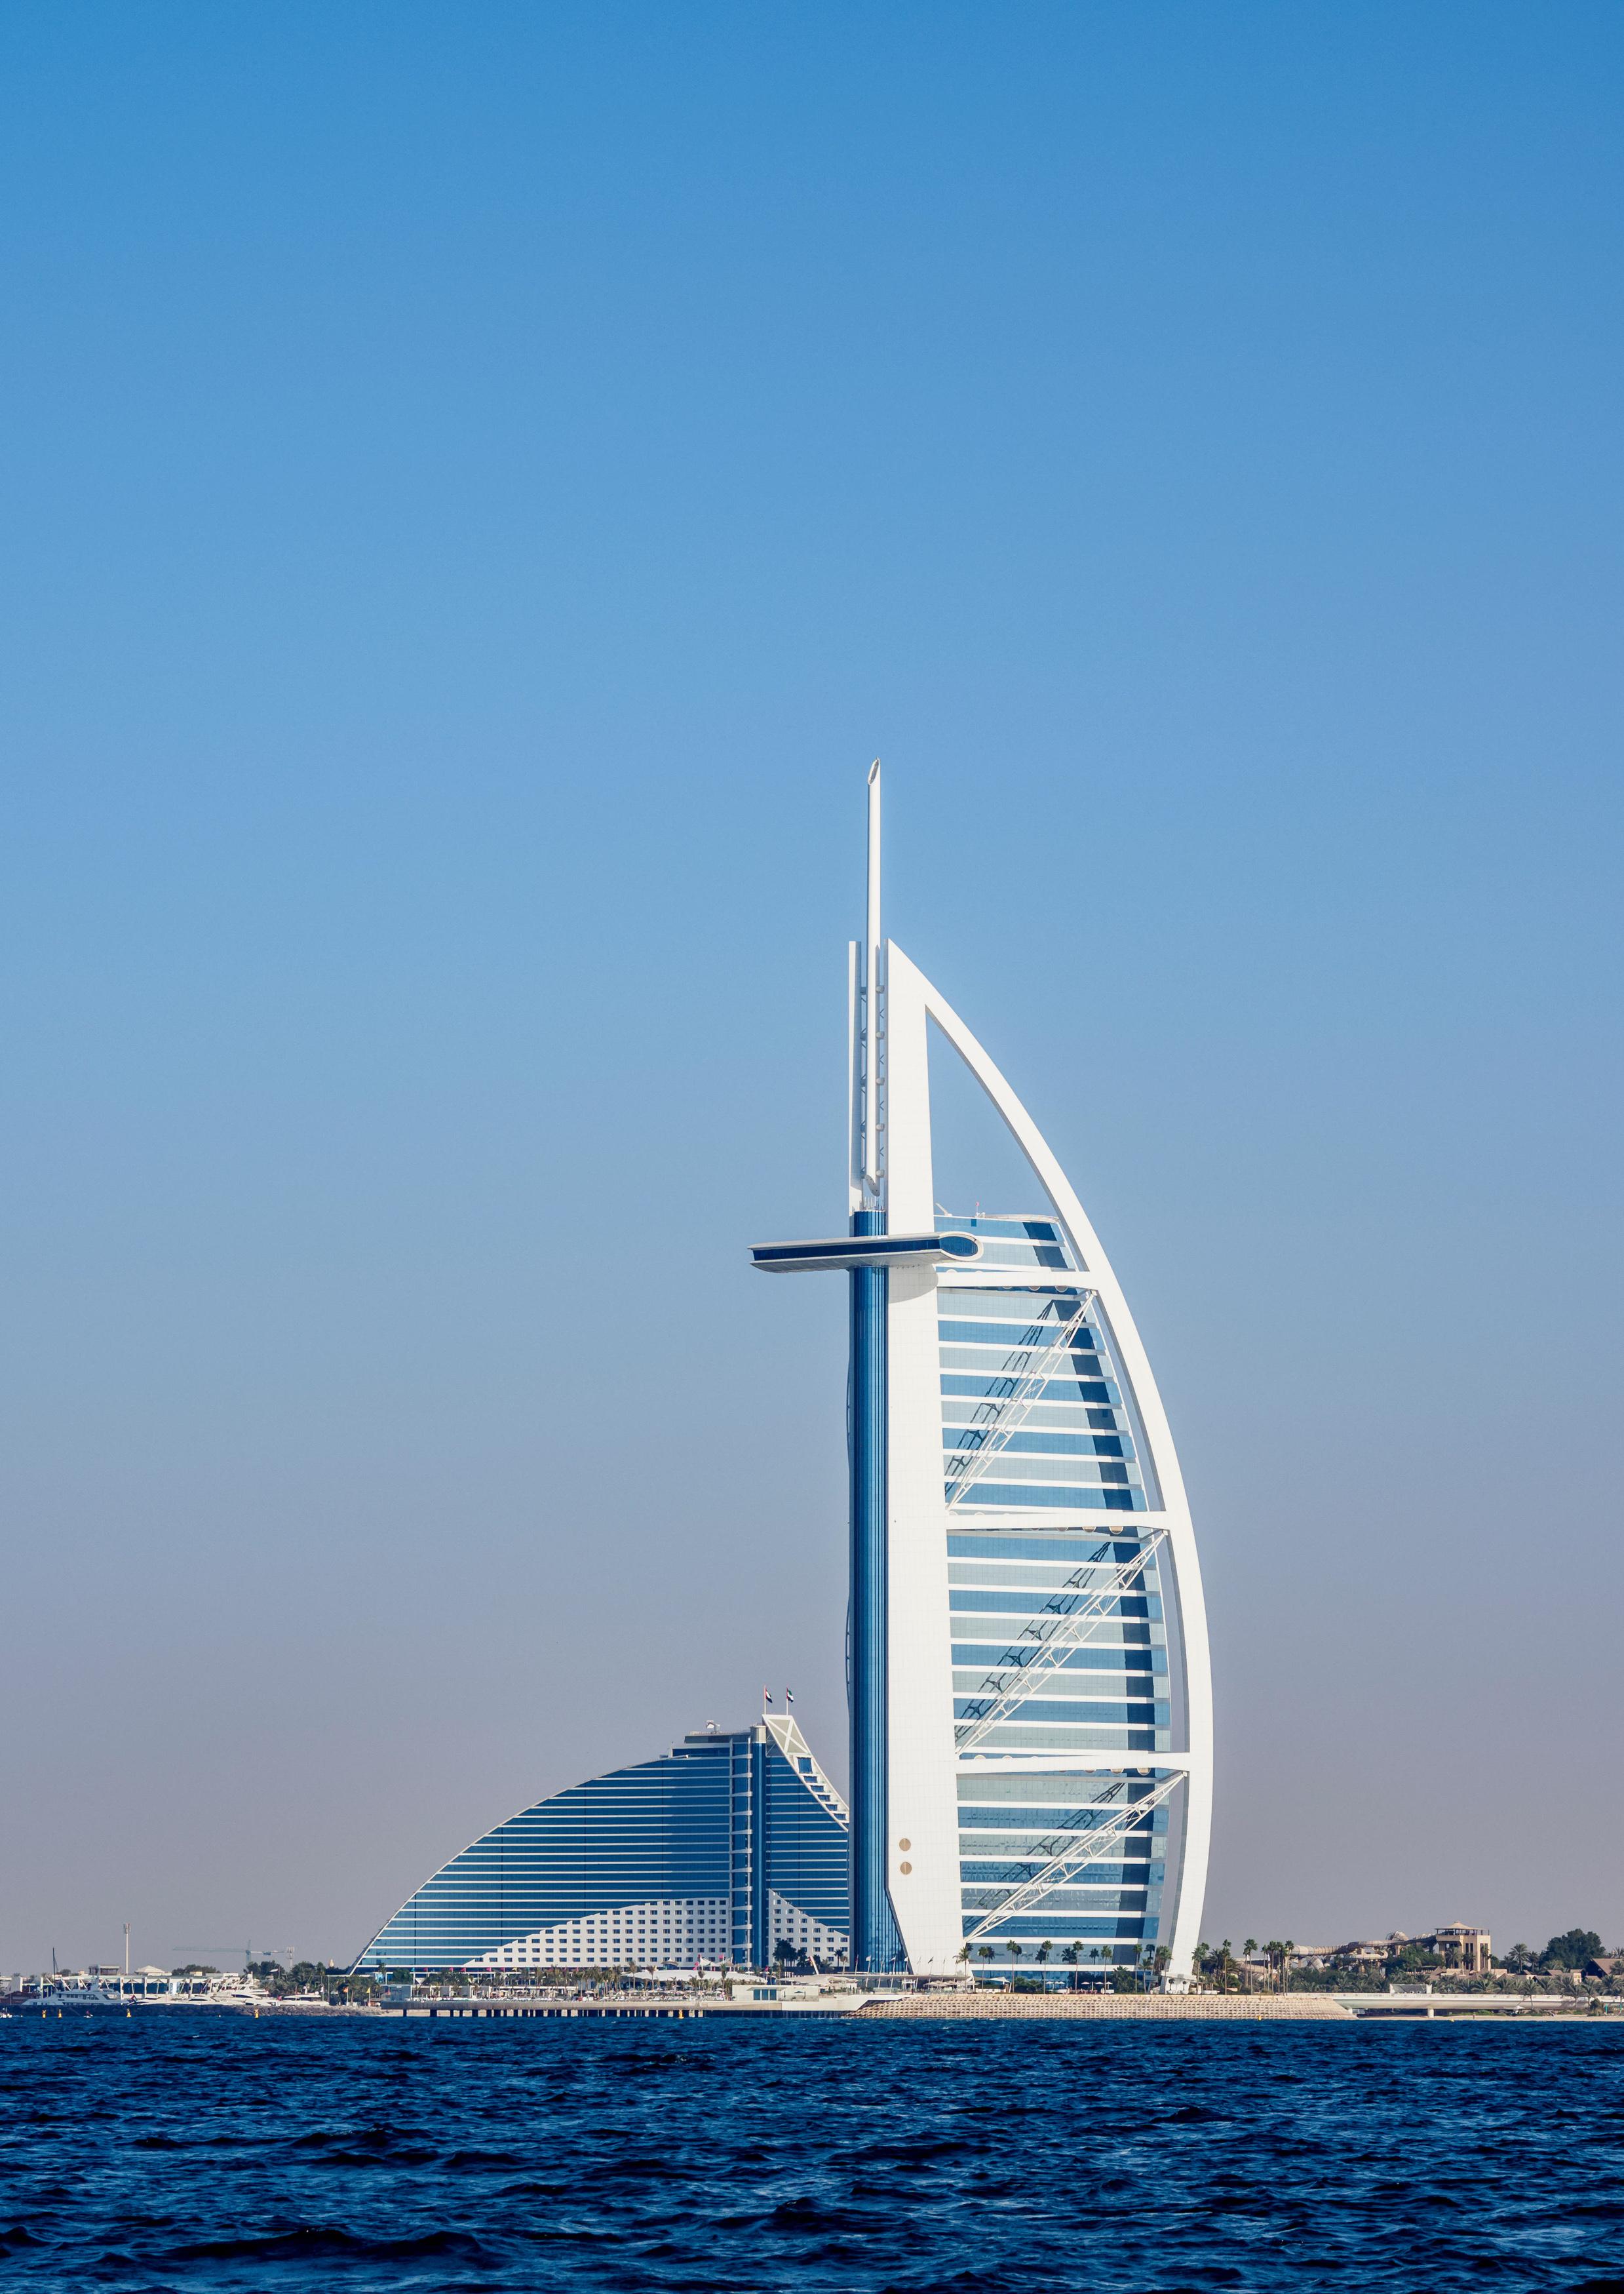 Burj Al Arab and Jumeirah Beach Hotels, Dubai, United Arab Emirates